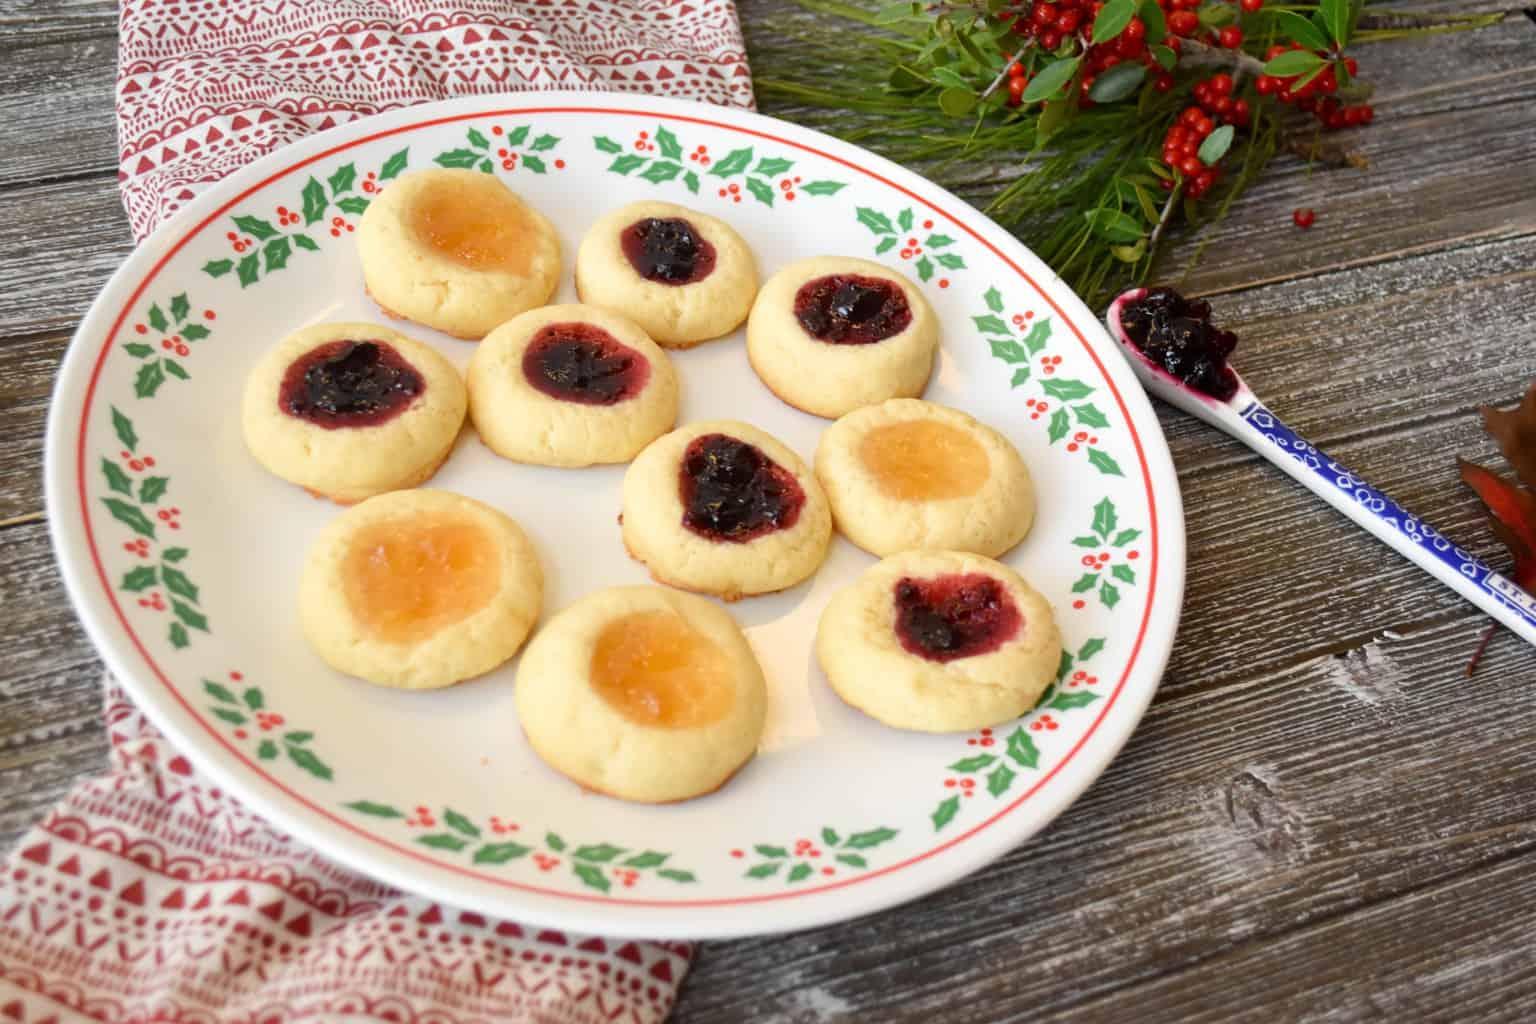 "<img src=""https://cdn.shortpixel.ai/client/q_glossy,ret_img,w_4096,h_2730/Jam Thumbprint cookies.jpg"" alt=""JamThumb print cookies with jam"">"